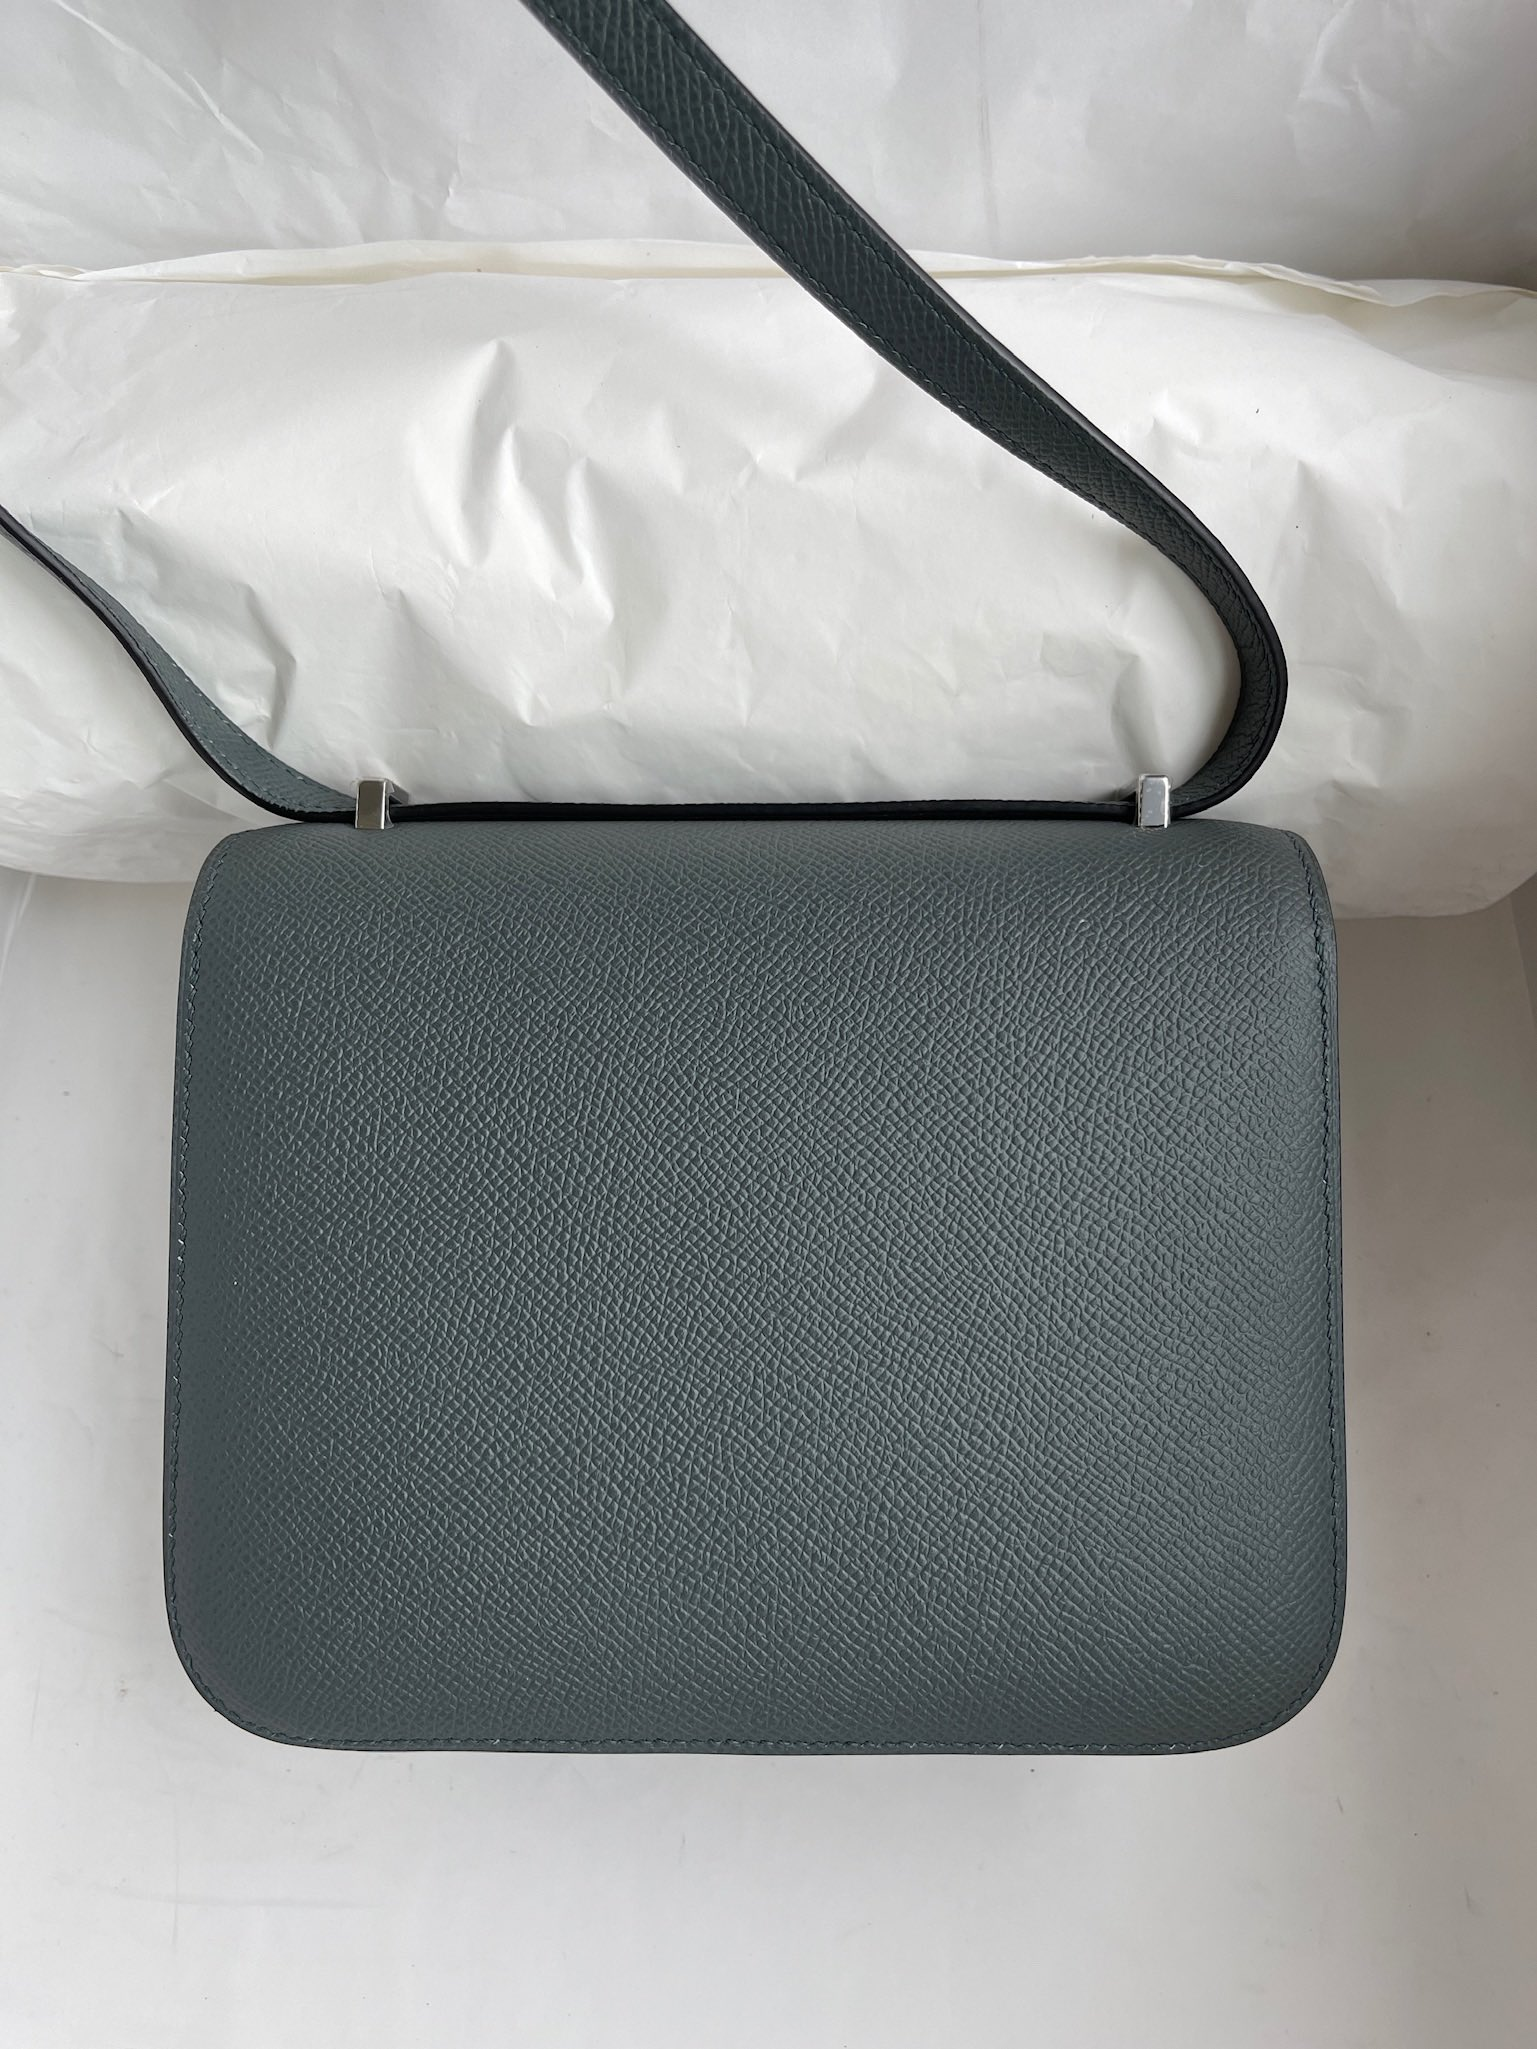 Hermès(爱马仕)Constance 康斯坦斯 Epsom 原厂掌纹皮 cc63 杏绿色 银扣 18cm 顶级手缝